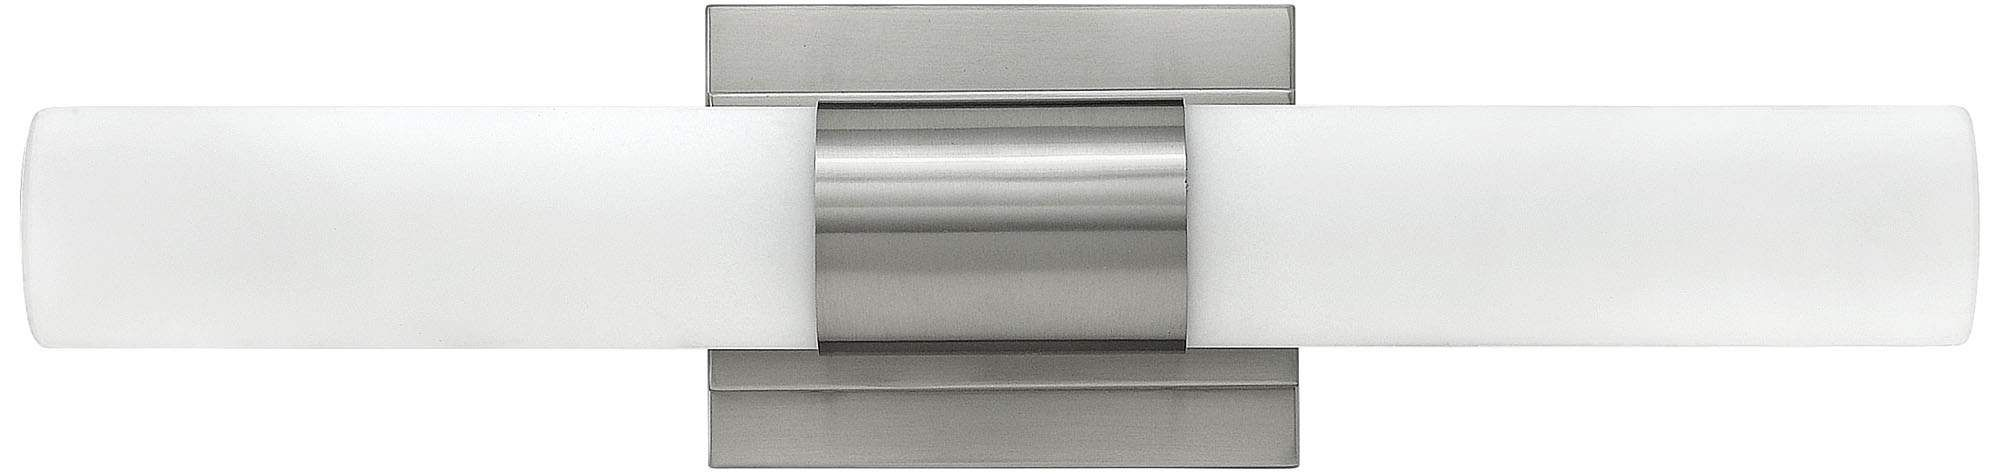 Photo of Hinkley Portia 19 Inch Wide Brushed Nickel Led Bath Light